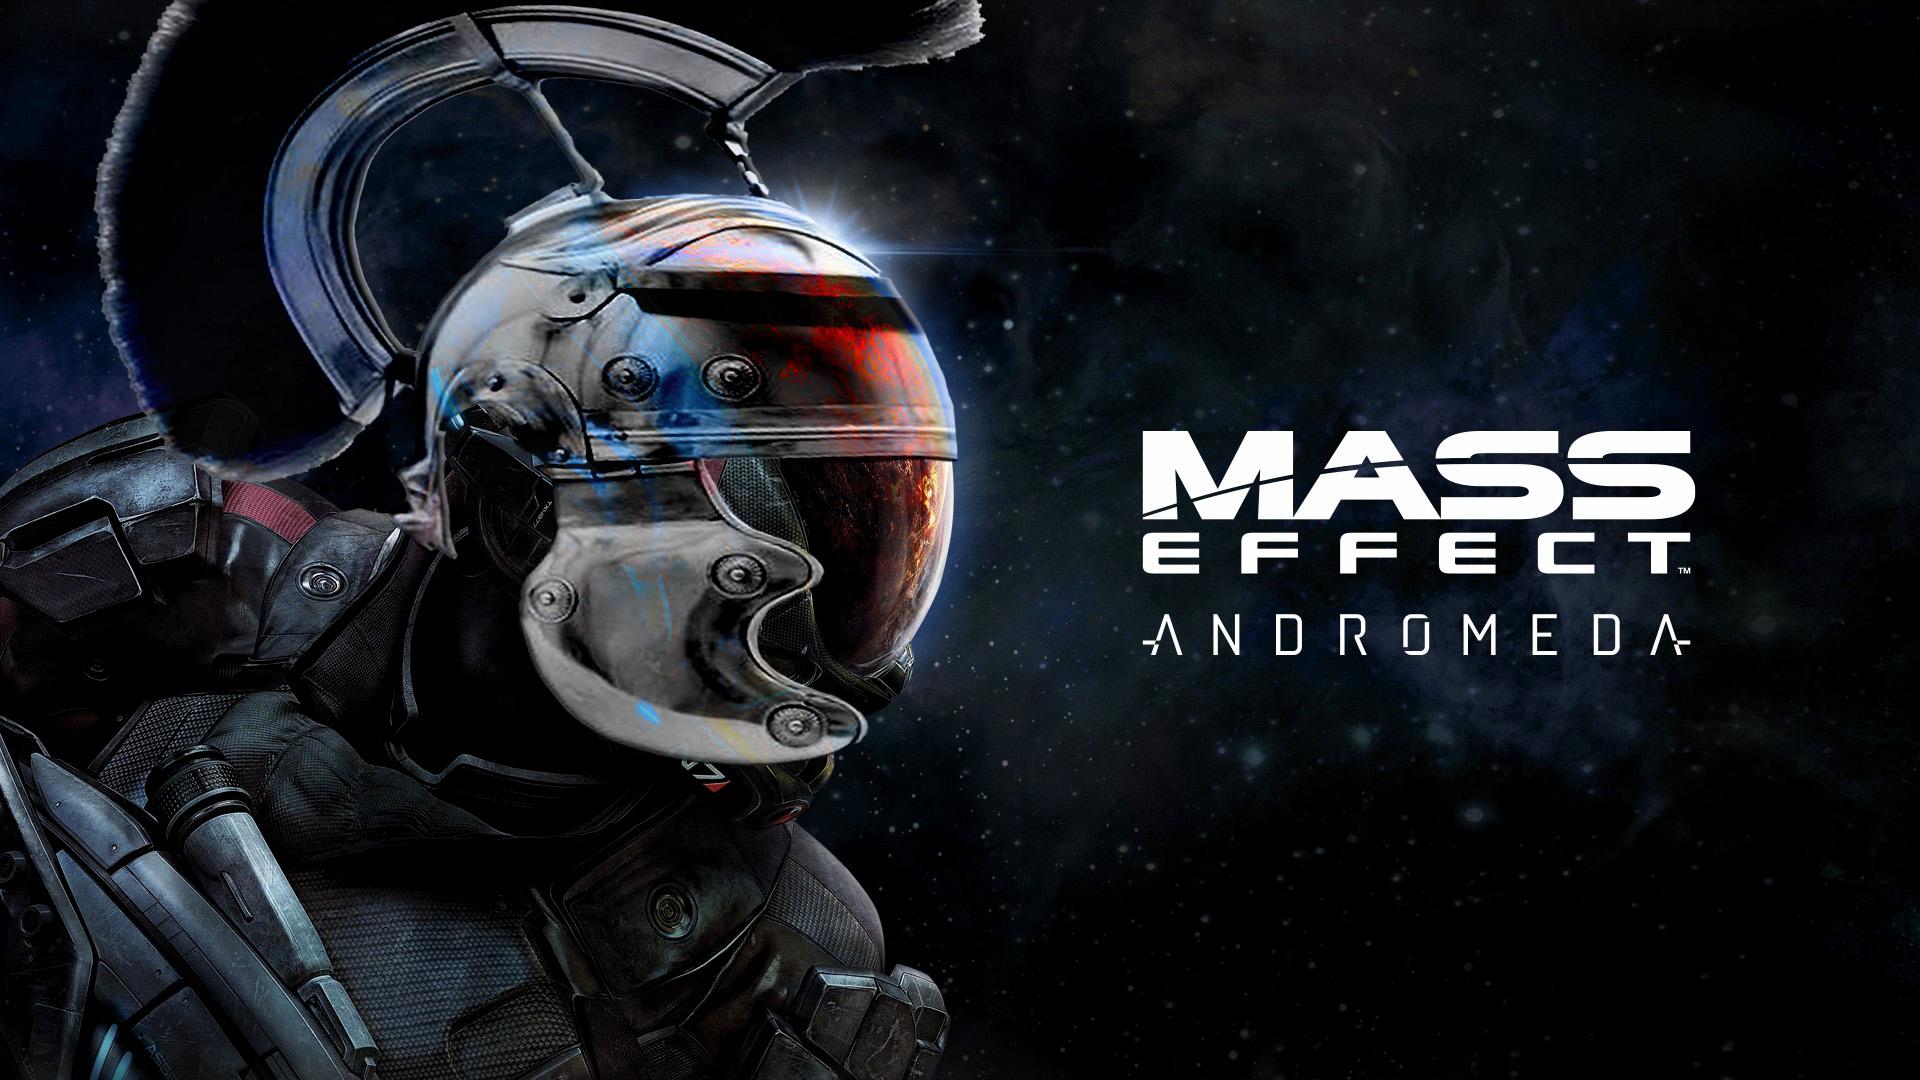 Steam Workshop Legion217s Mass Effect Wotc Mod List Wip